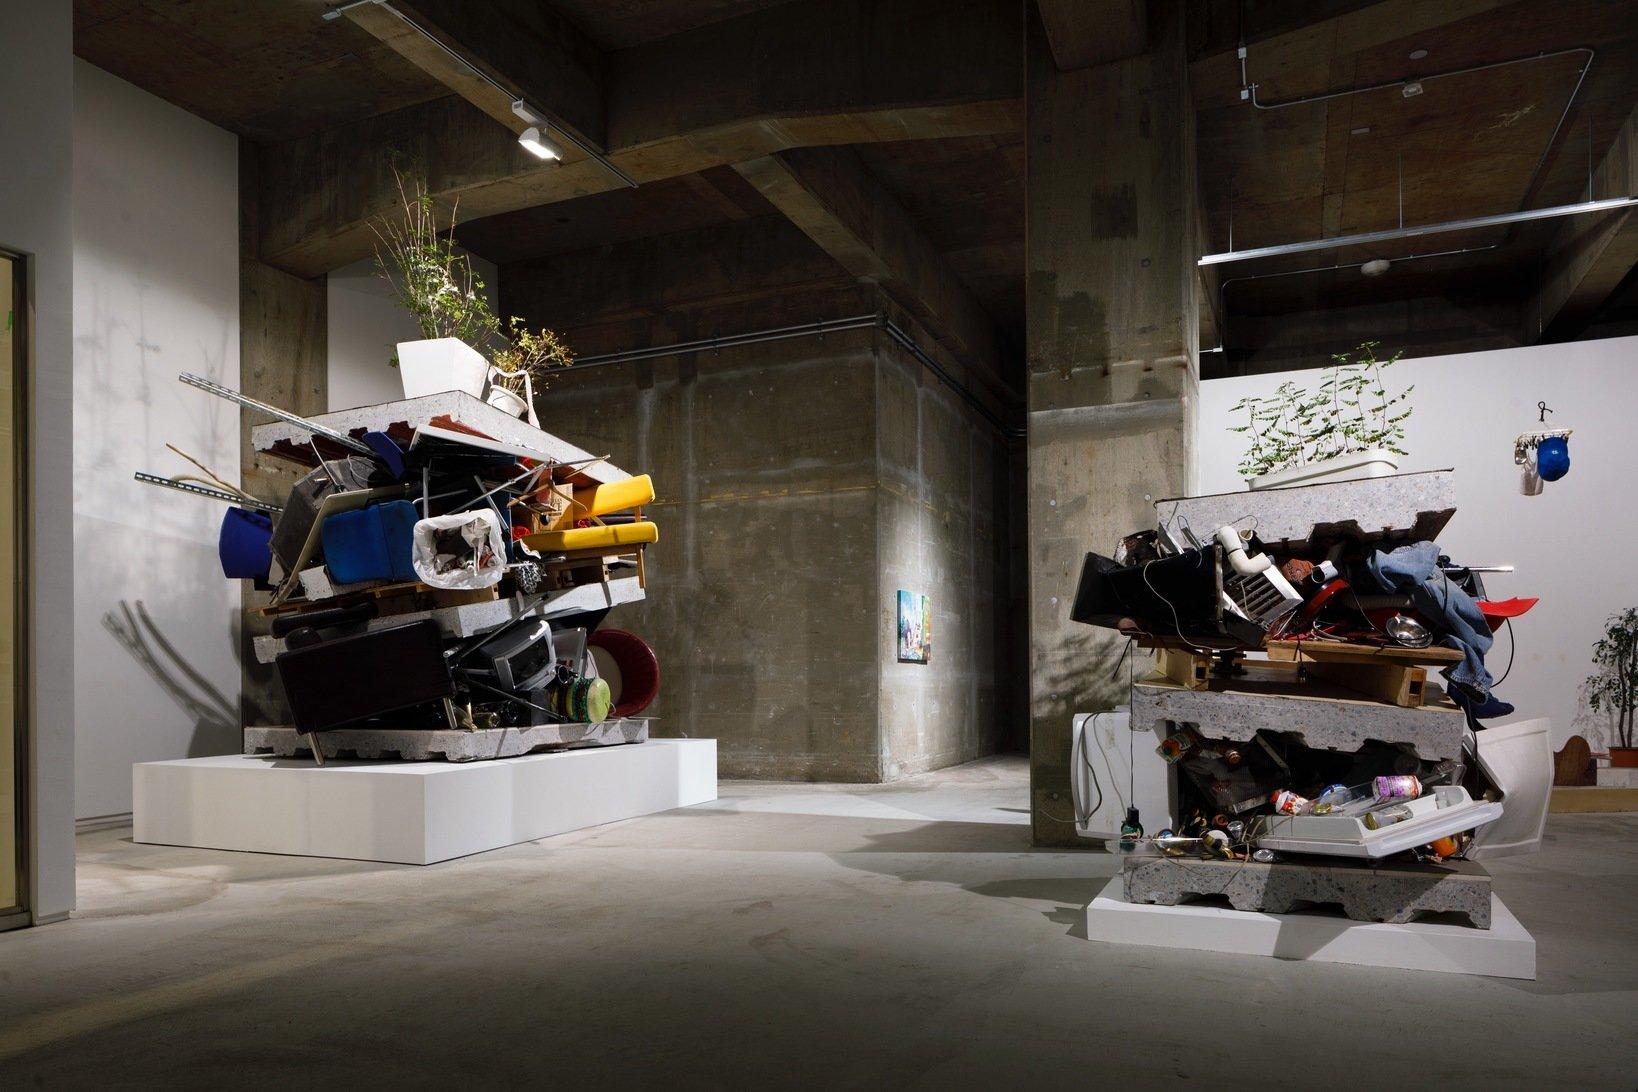 ANOMALYでは、2019年1月26日(土)までChim↑Pom(チンポム)の展覧会「グランドオープン」が開催されている。Chim↑Pom「グランドオープン」展示風景 ©︎Chim↑Pom, Courtesy of ANOMALY, Tokyo Photo by Kenji Morita